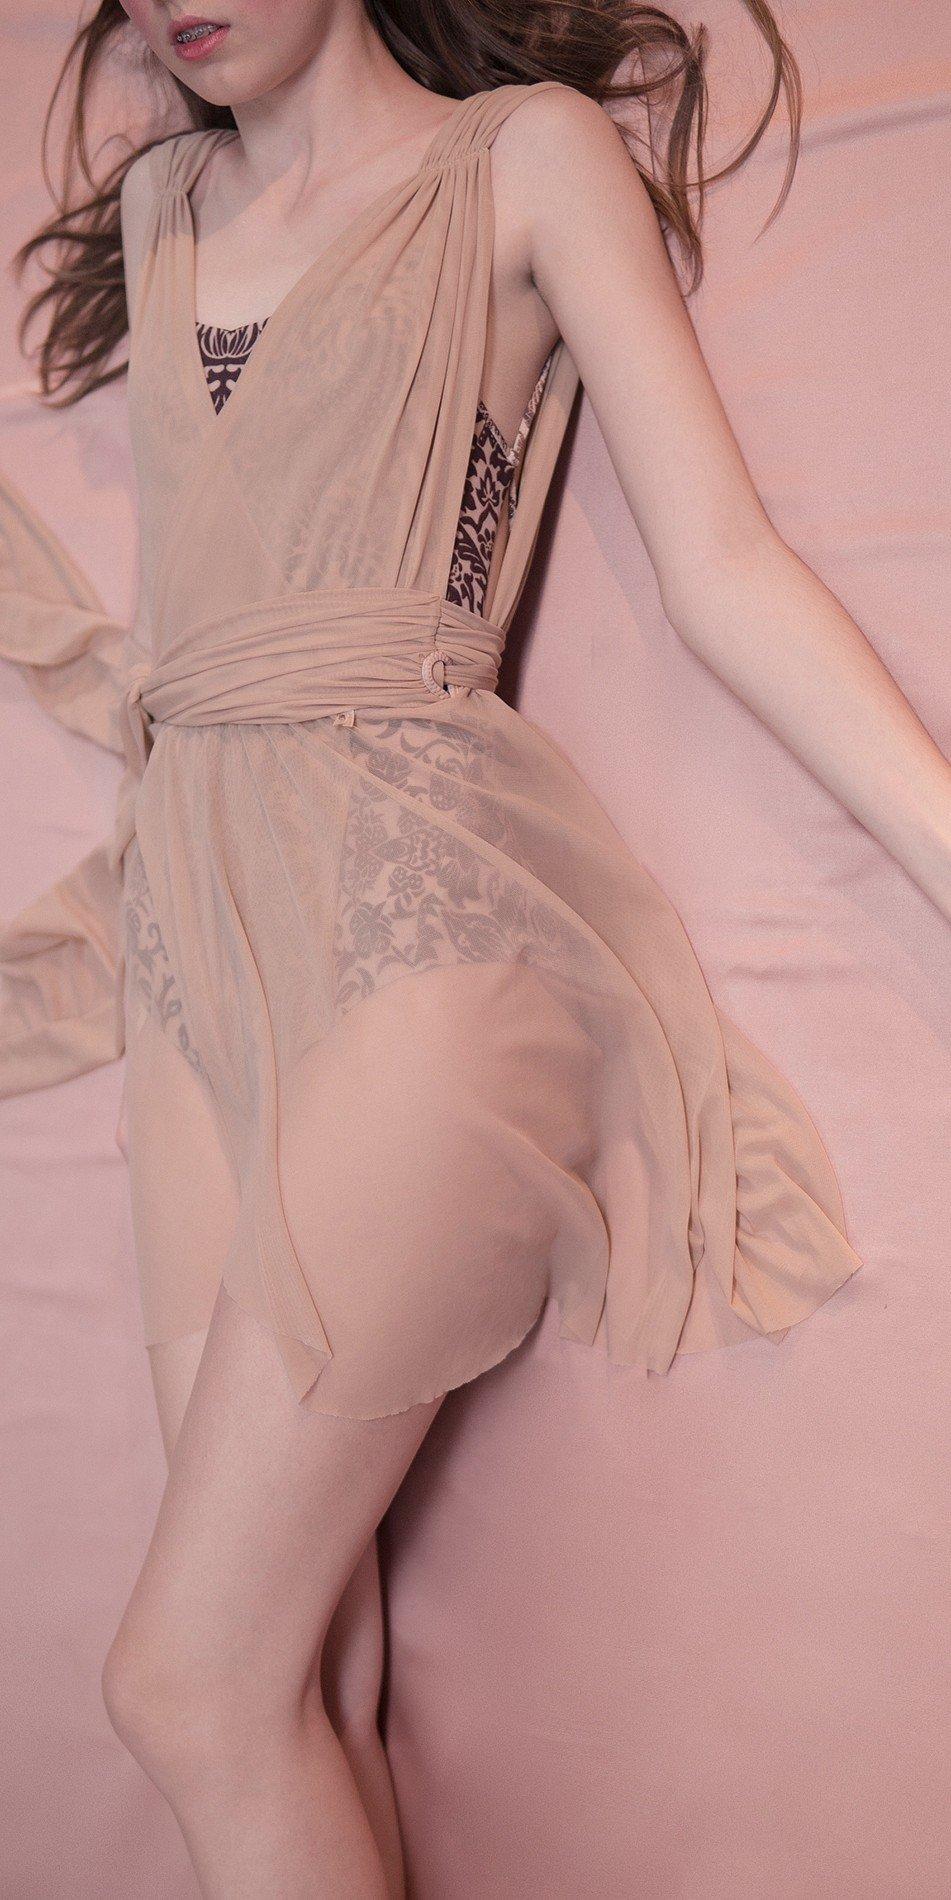 GRES draped20wrap20dress nude 3 r 1